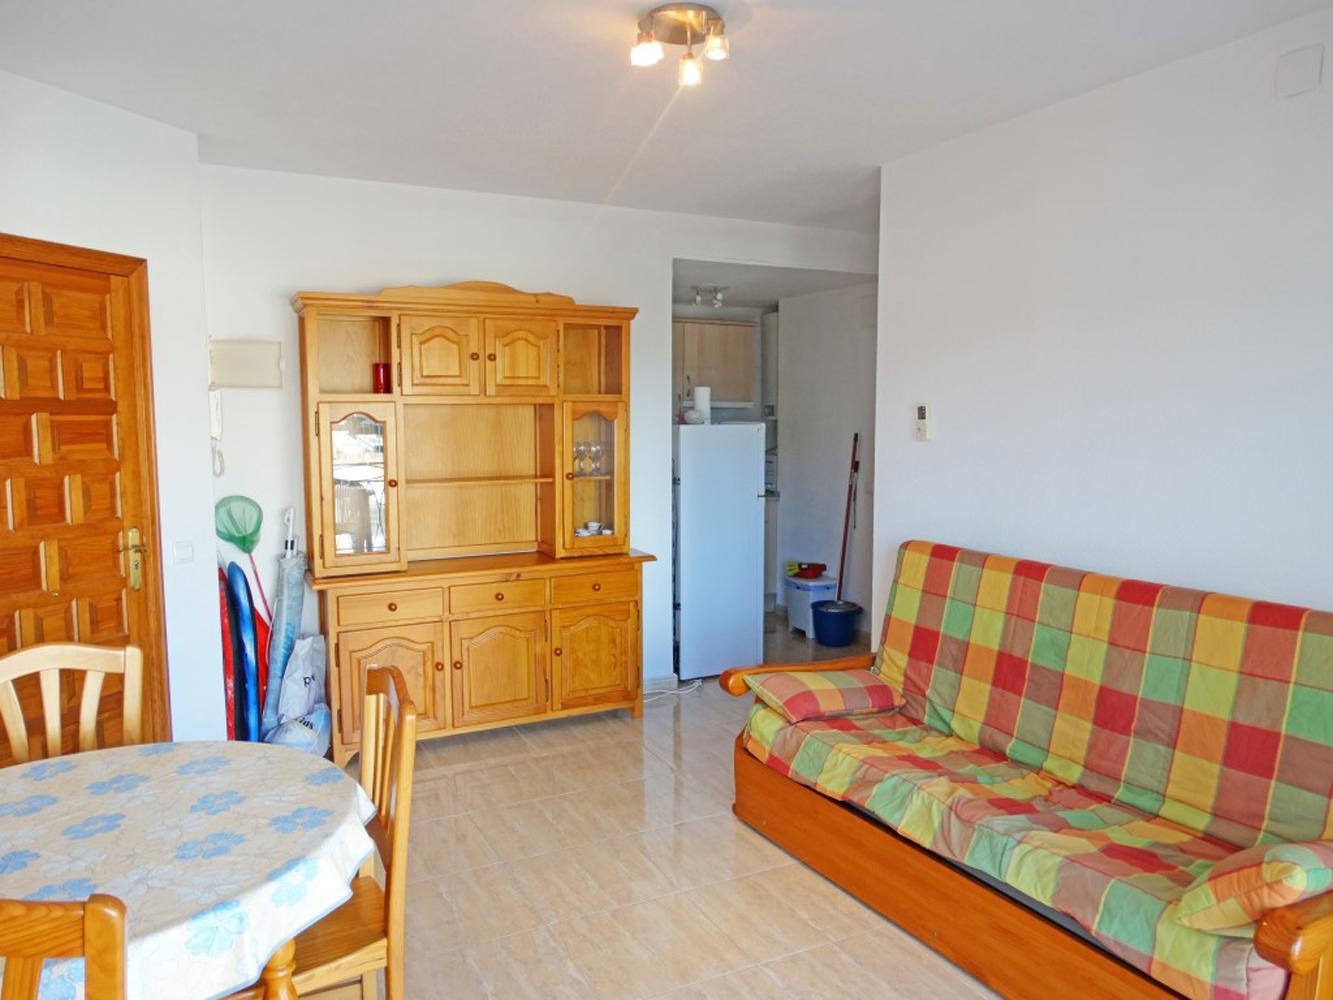 Apartamento paola en calpe comprar y vender casa en calp benidorm altea moraira alicante - Compro apartamento en benidorm ...